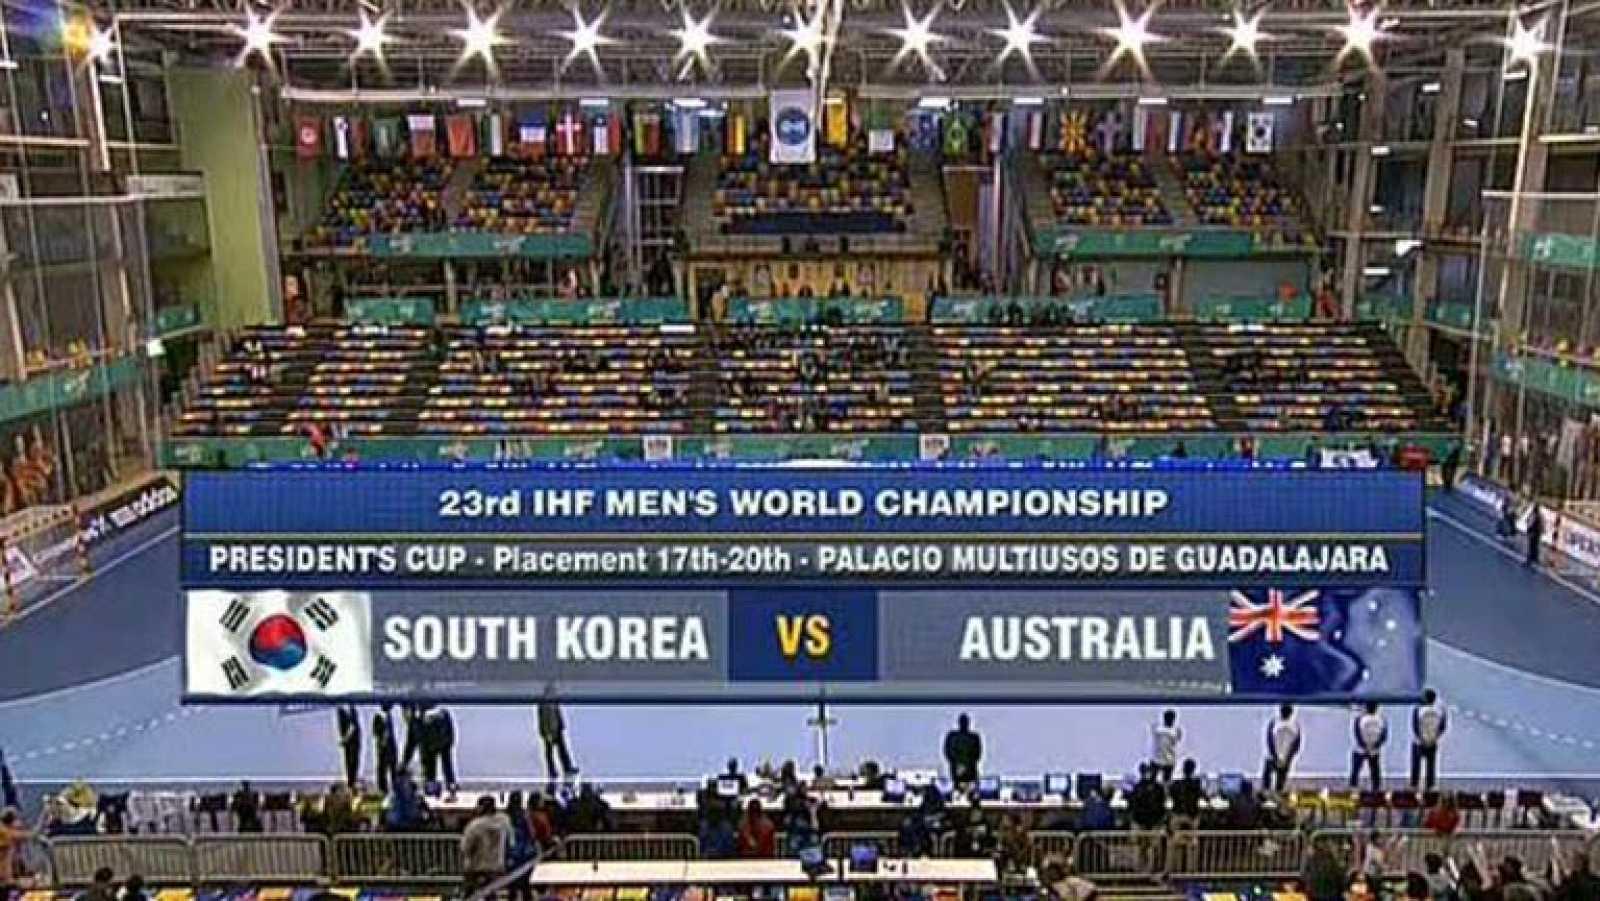 Mundial de Balonmano - President's Cup: Corea del Sur - Australia